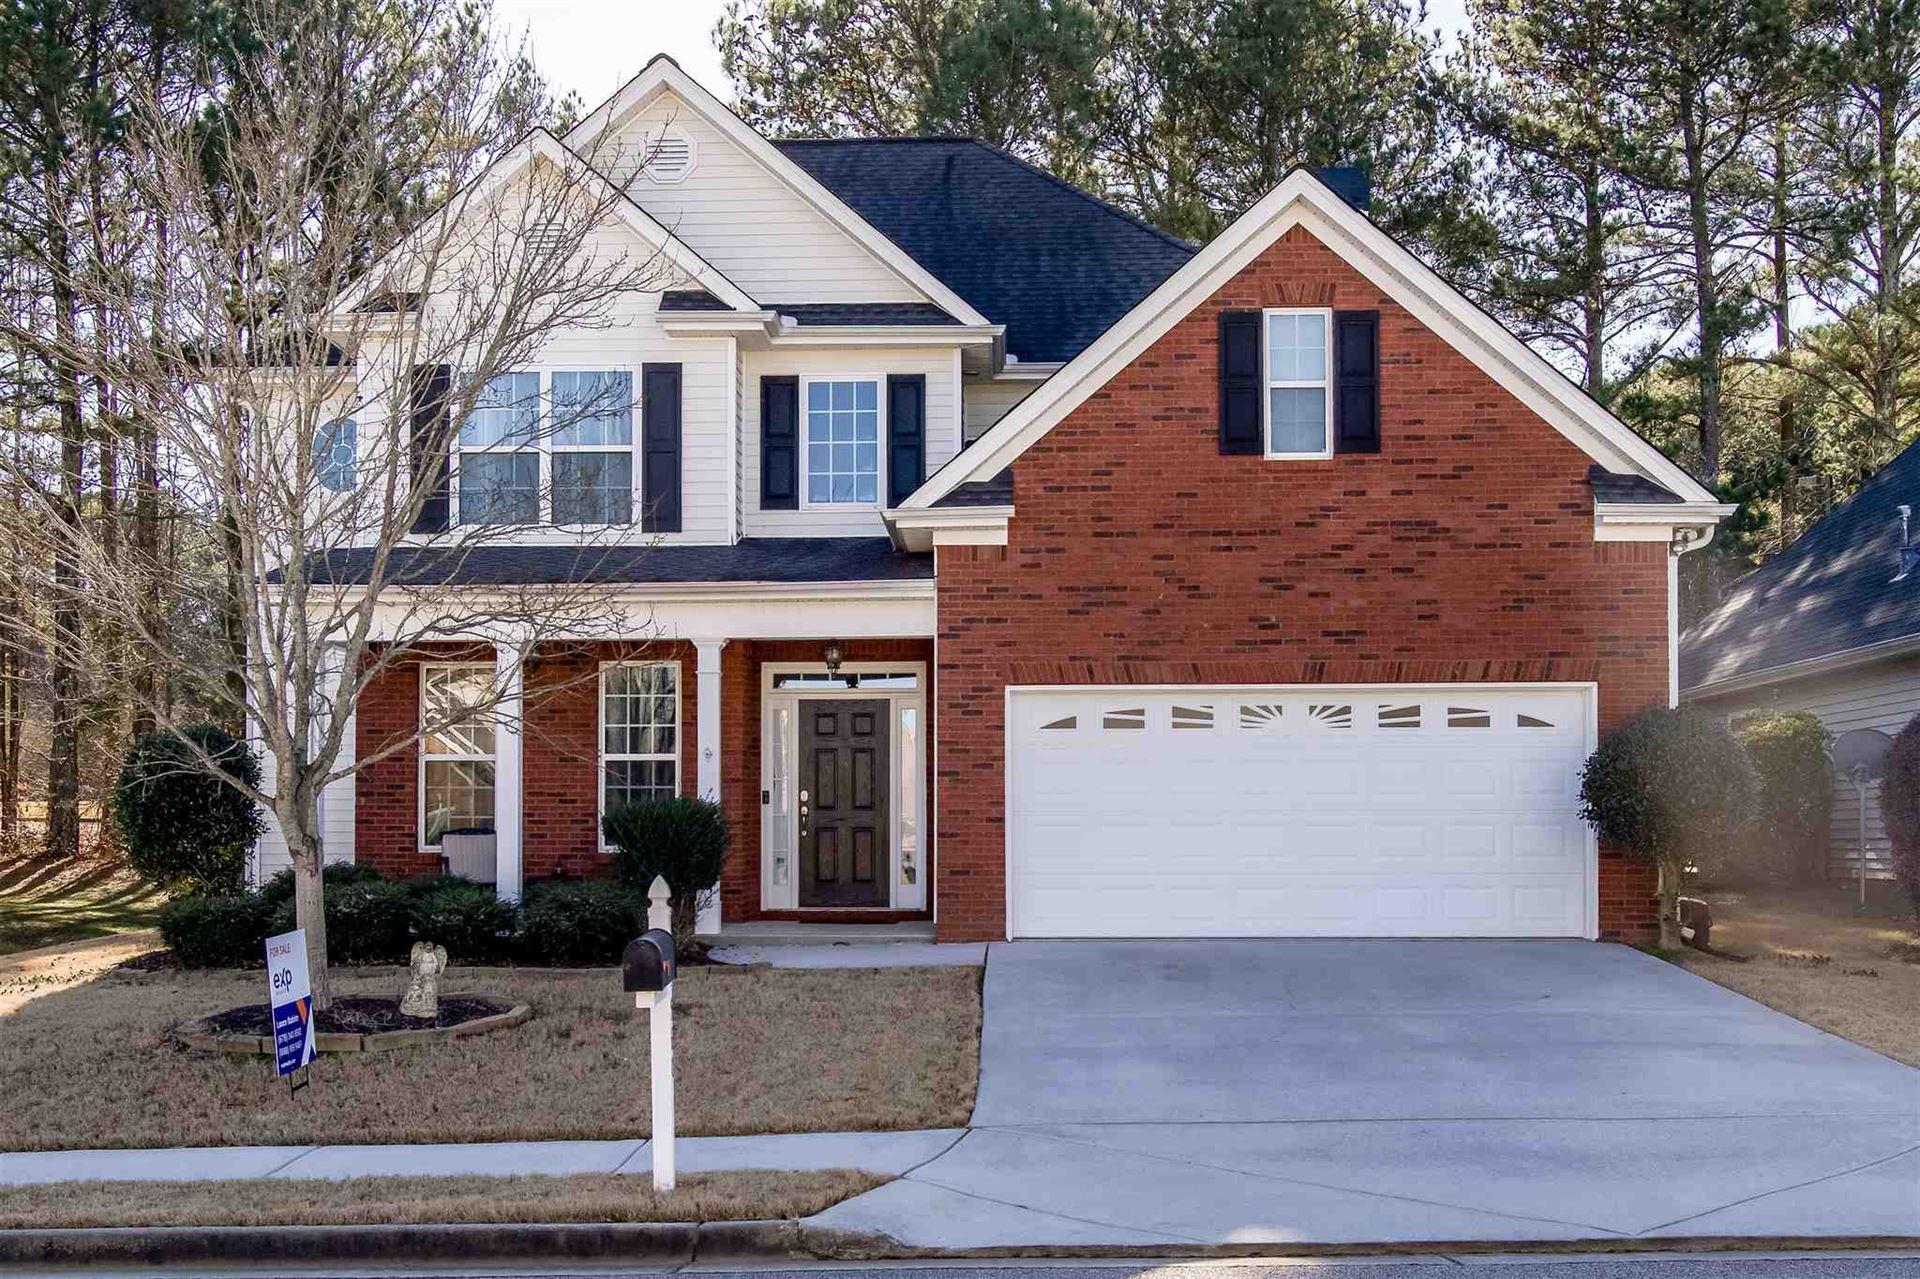 560 Millbrook Village Dr, Tyrone, GA 30290 - MLS#: 8912255